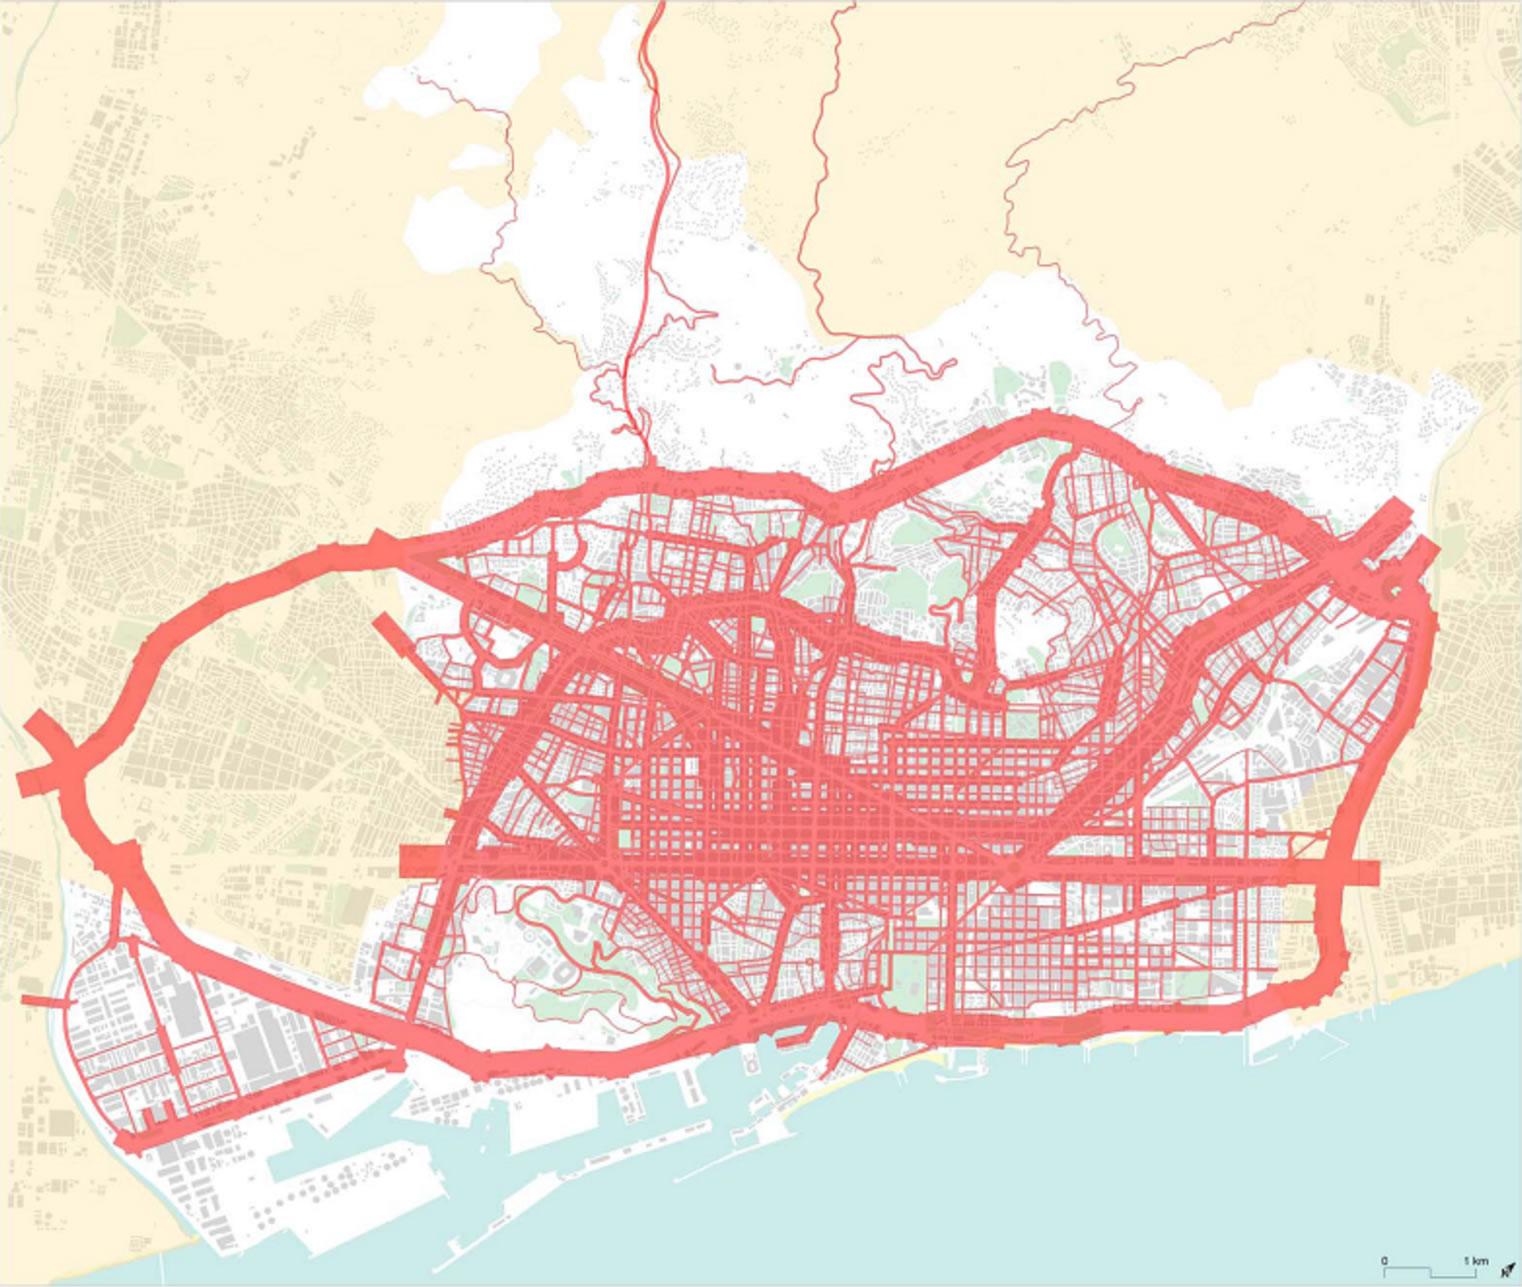 An Interpretation of the Recent Evolution of the City of Barcelona